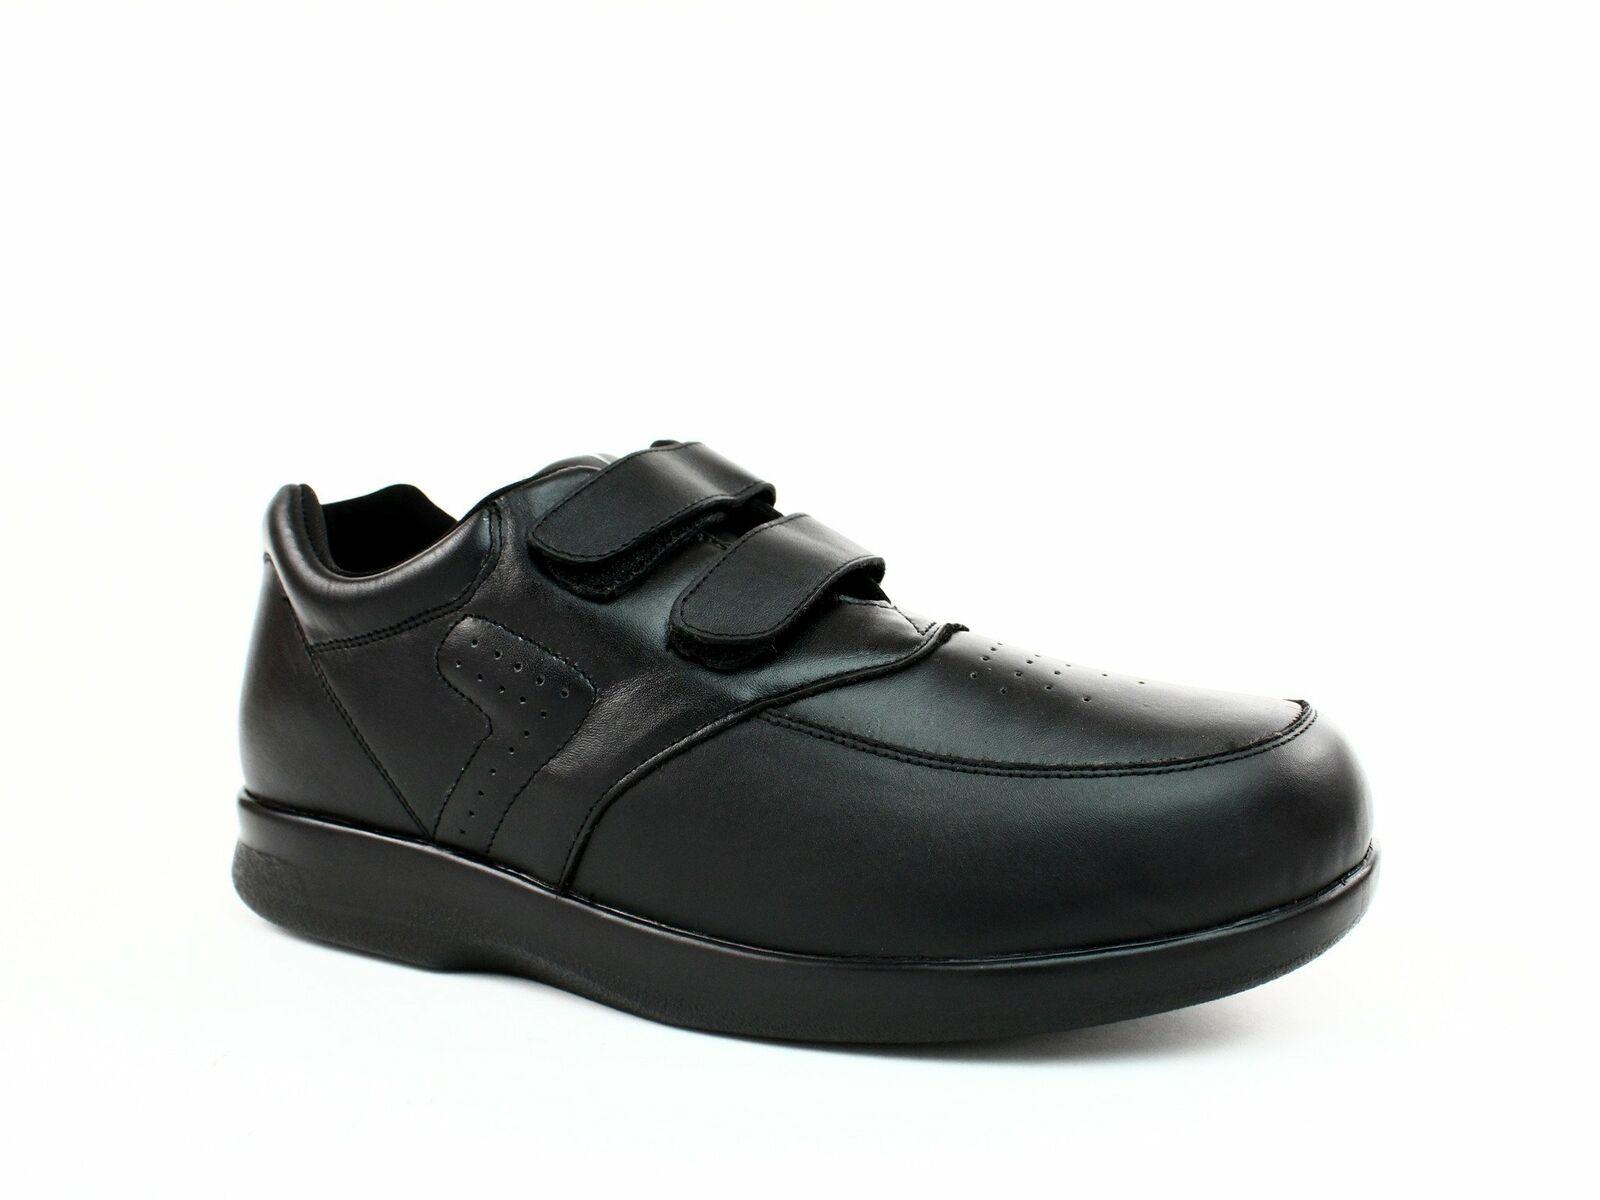 British Walkers Homme Noir Chaussures De Loisirs